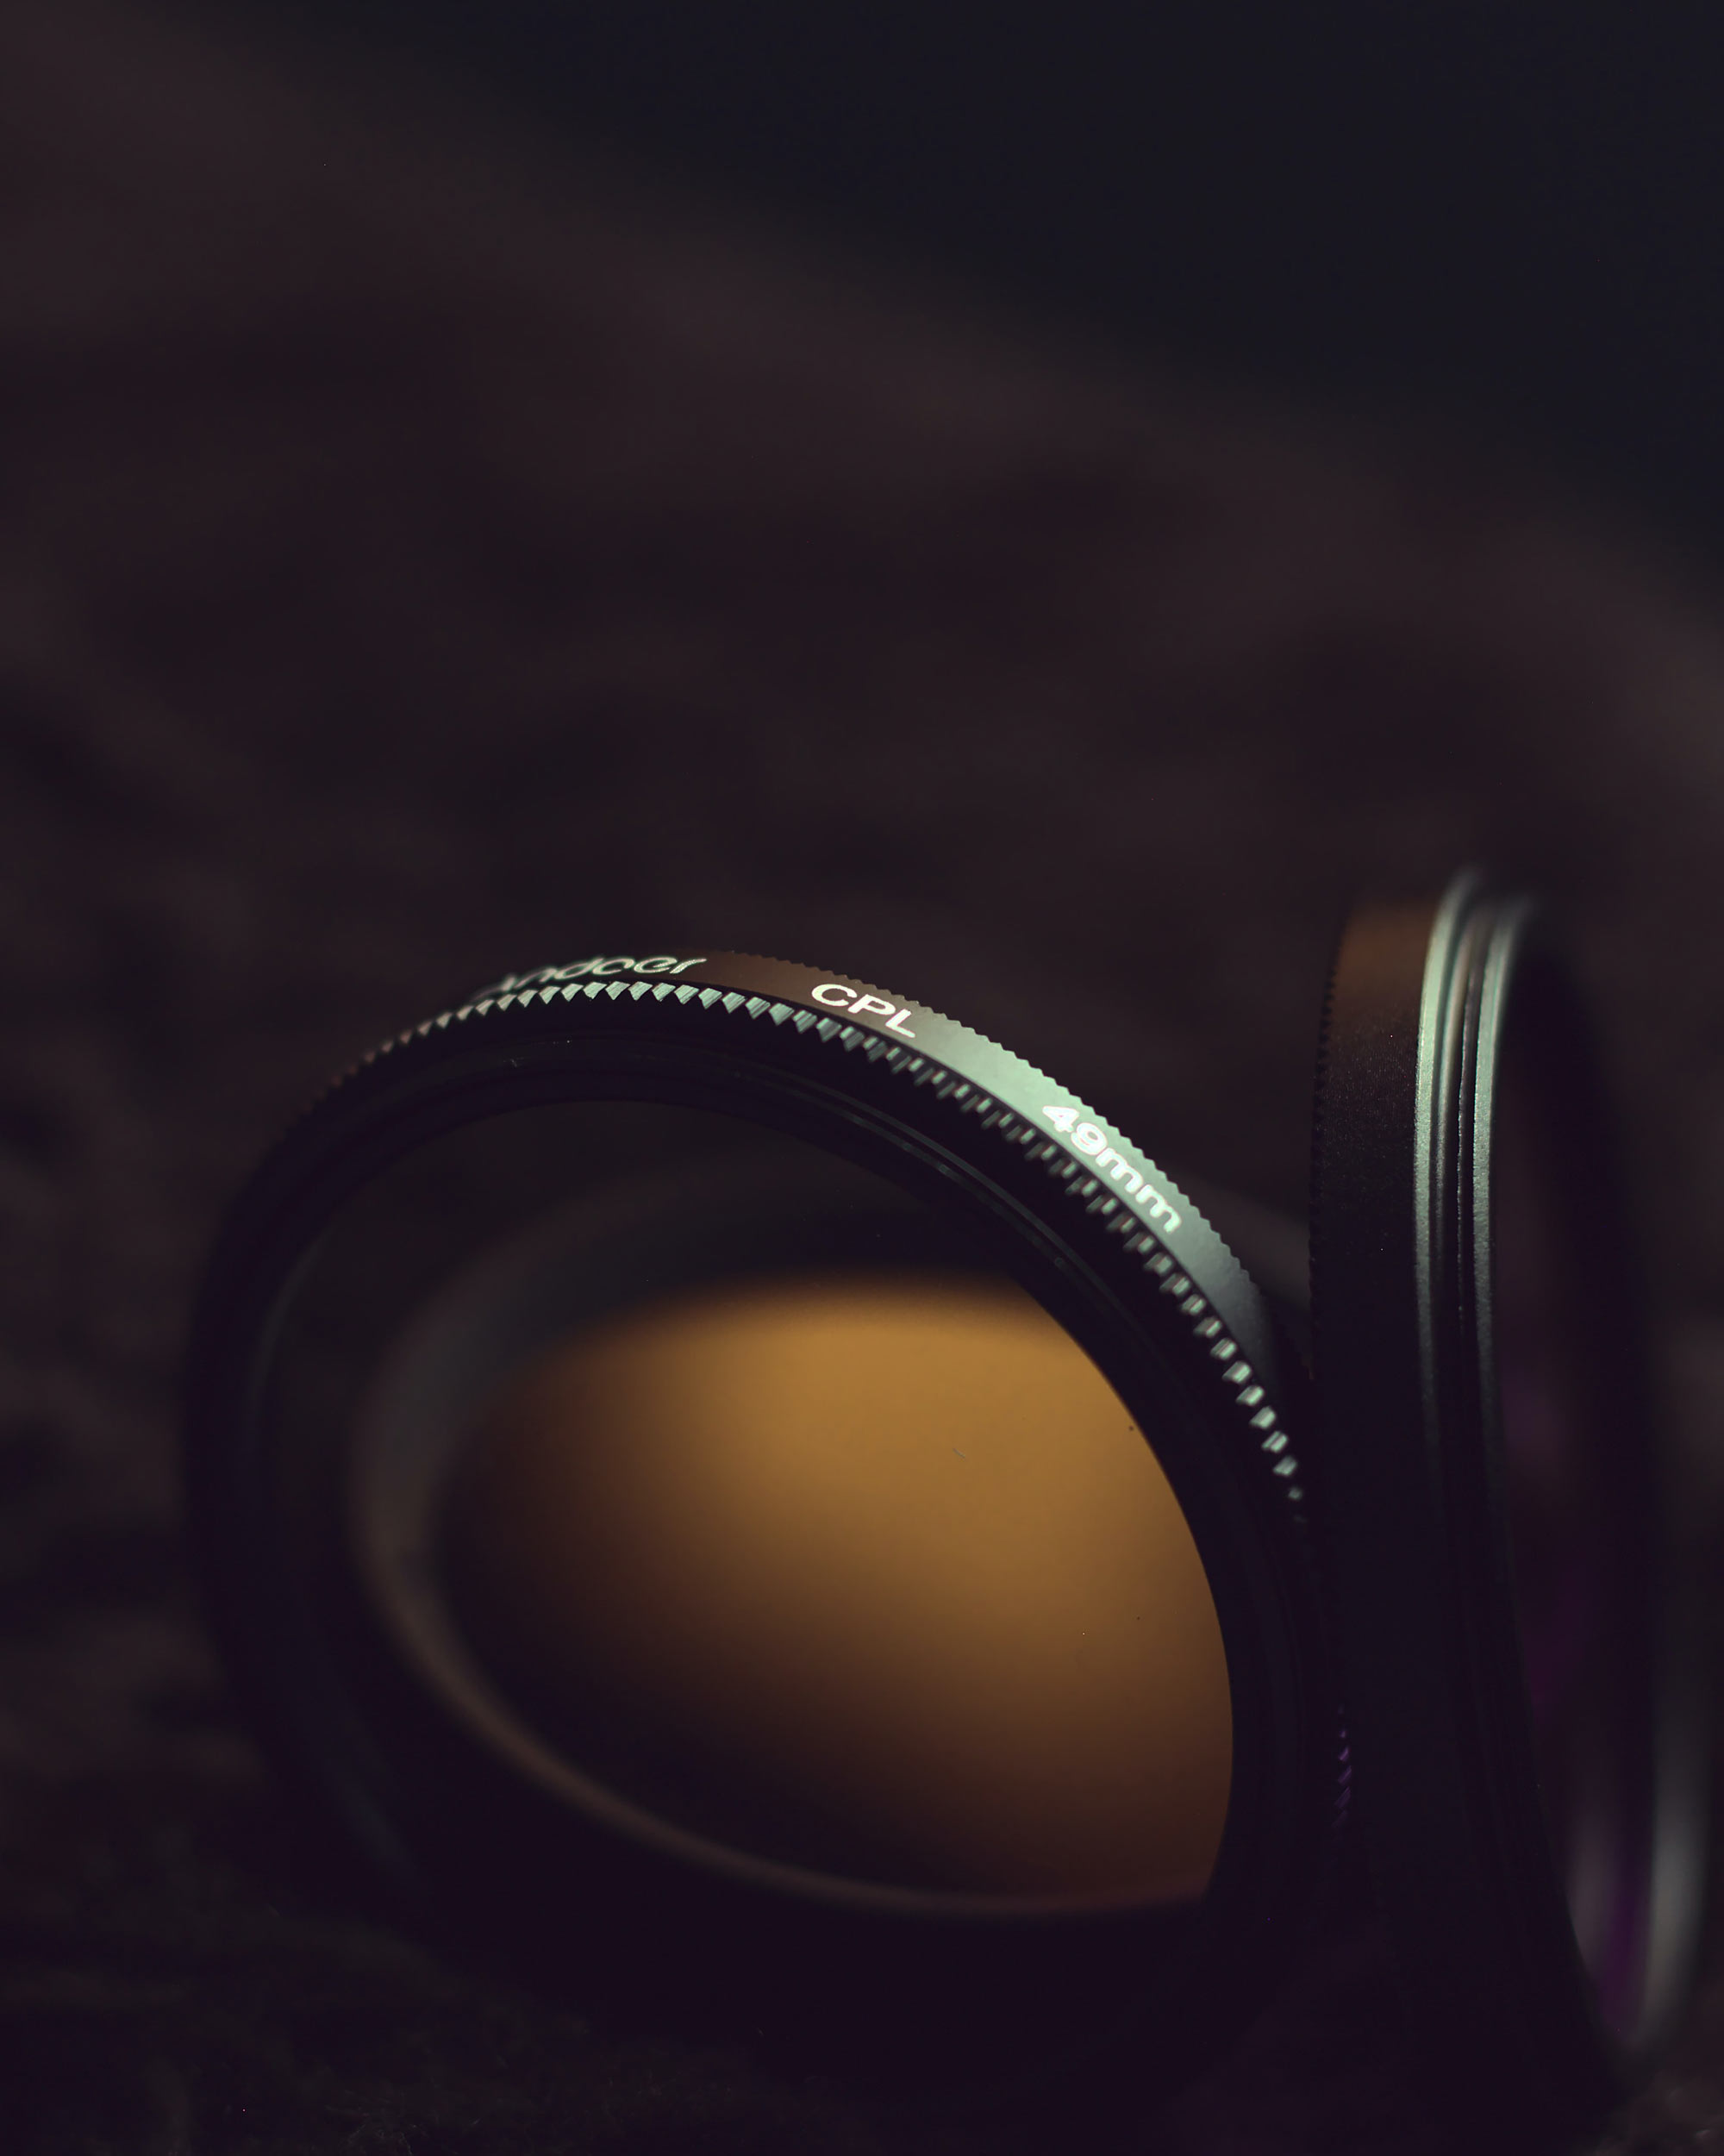 Objektivfilter Kaufberatung - Rentier